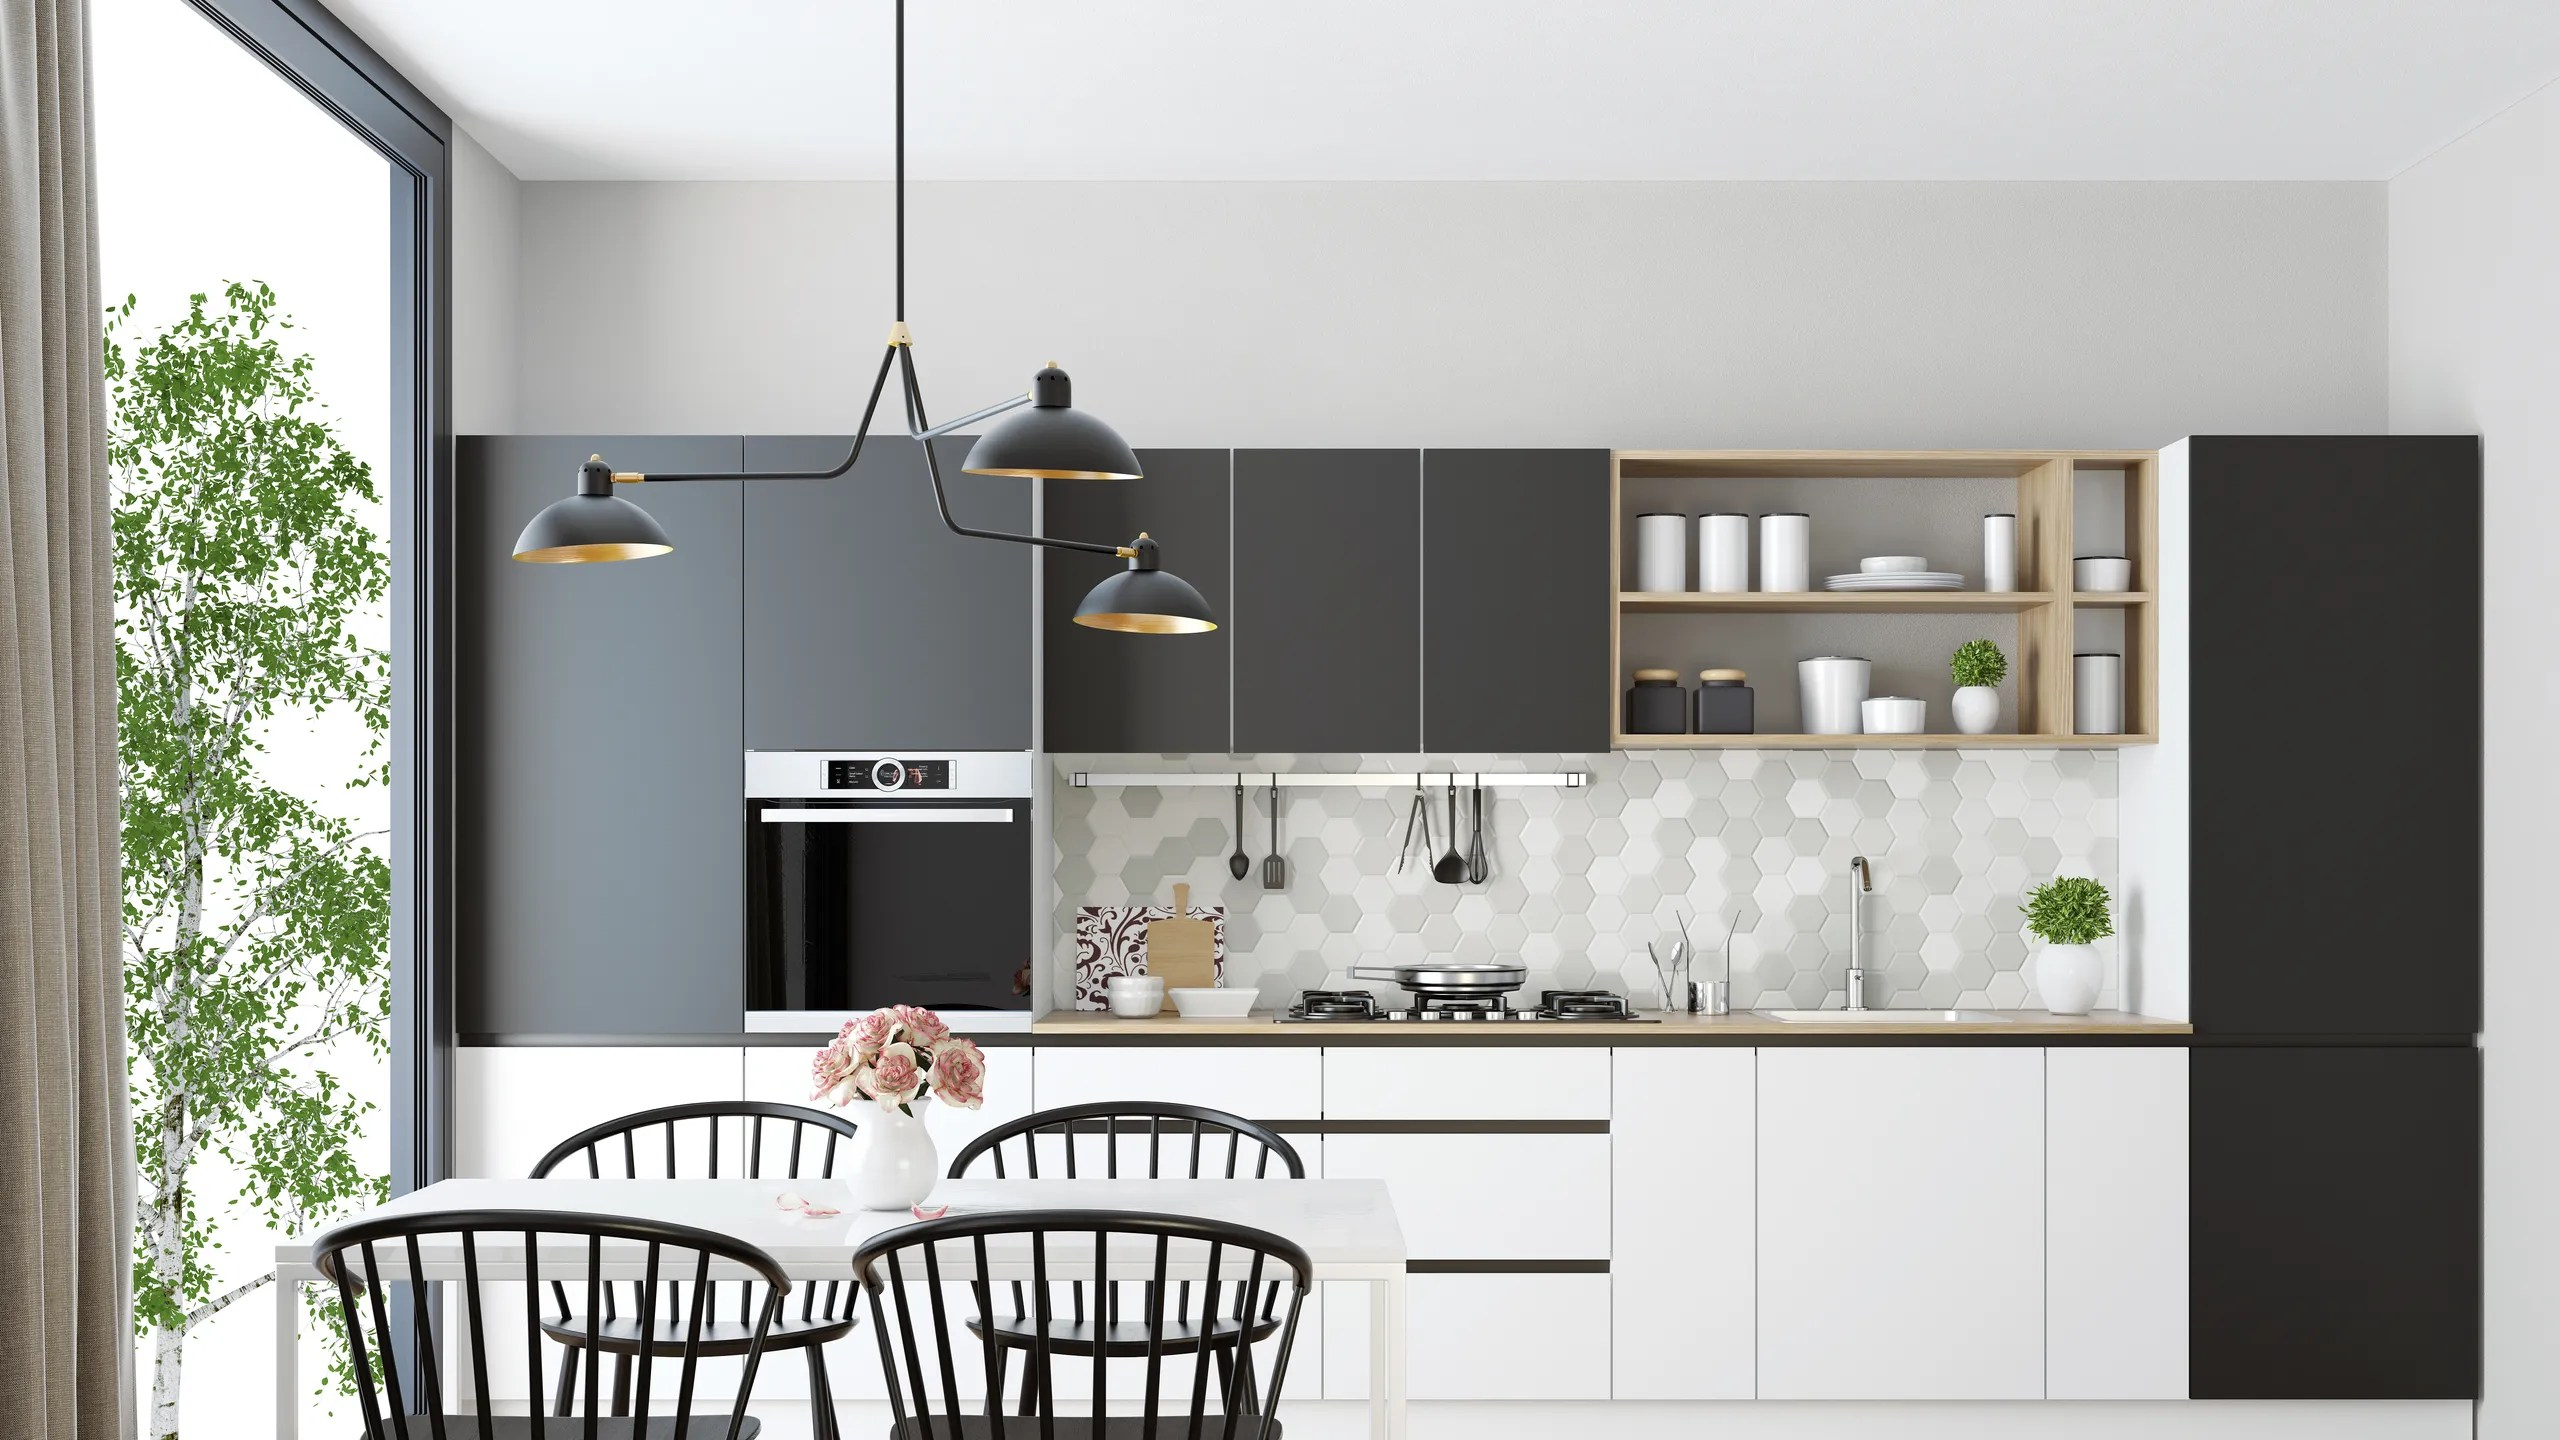 51 Small Kitchen Design Ideas That Make the Most of a Tiny ... on Farmhouse:4Leikoxevec= Rustic Kitchen Ideas  id=71569